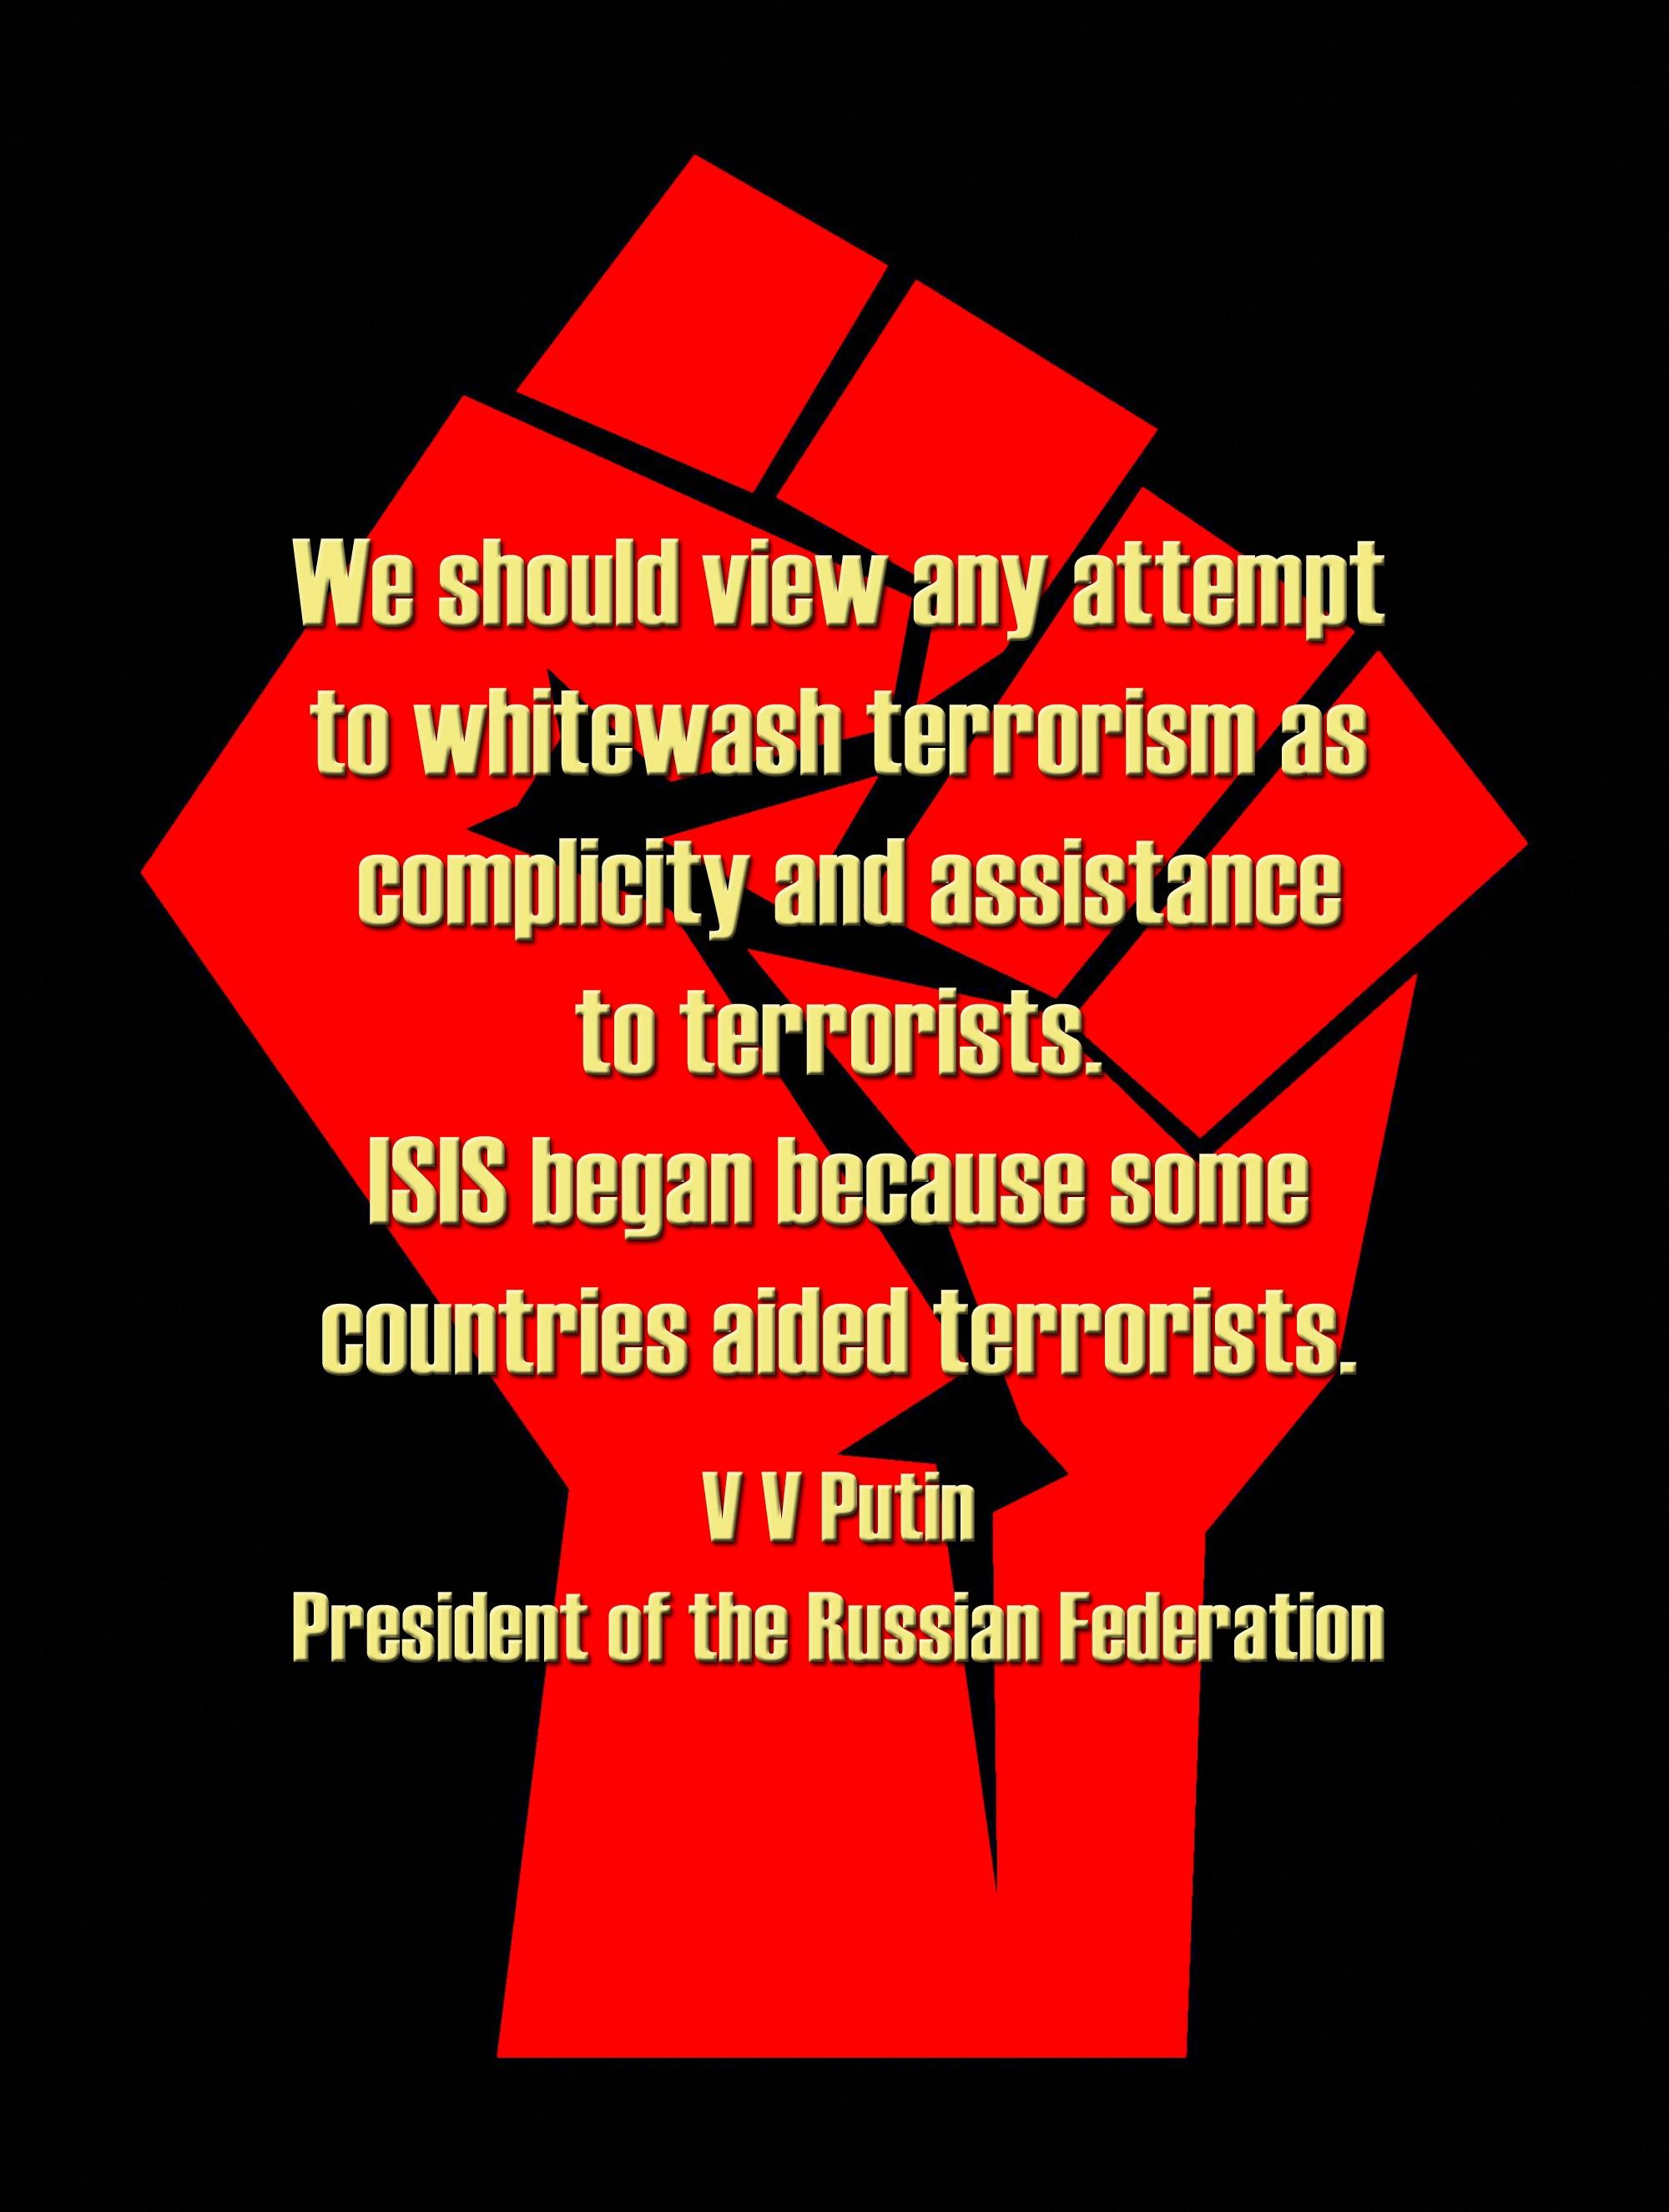 00 putin on terror and isis 261115